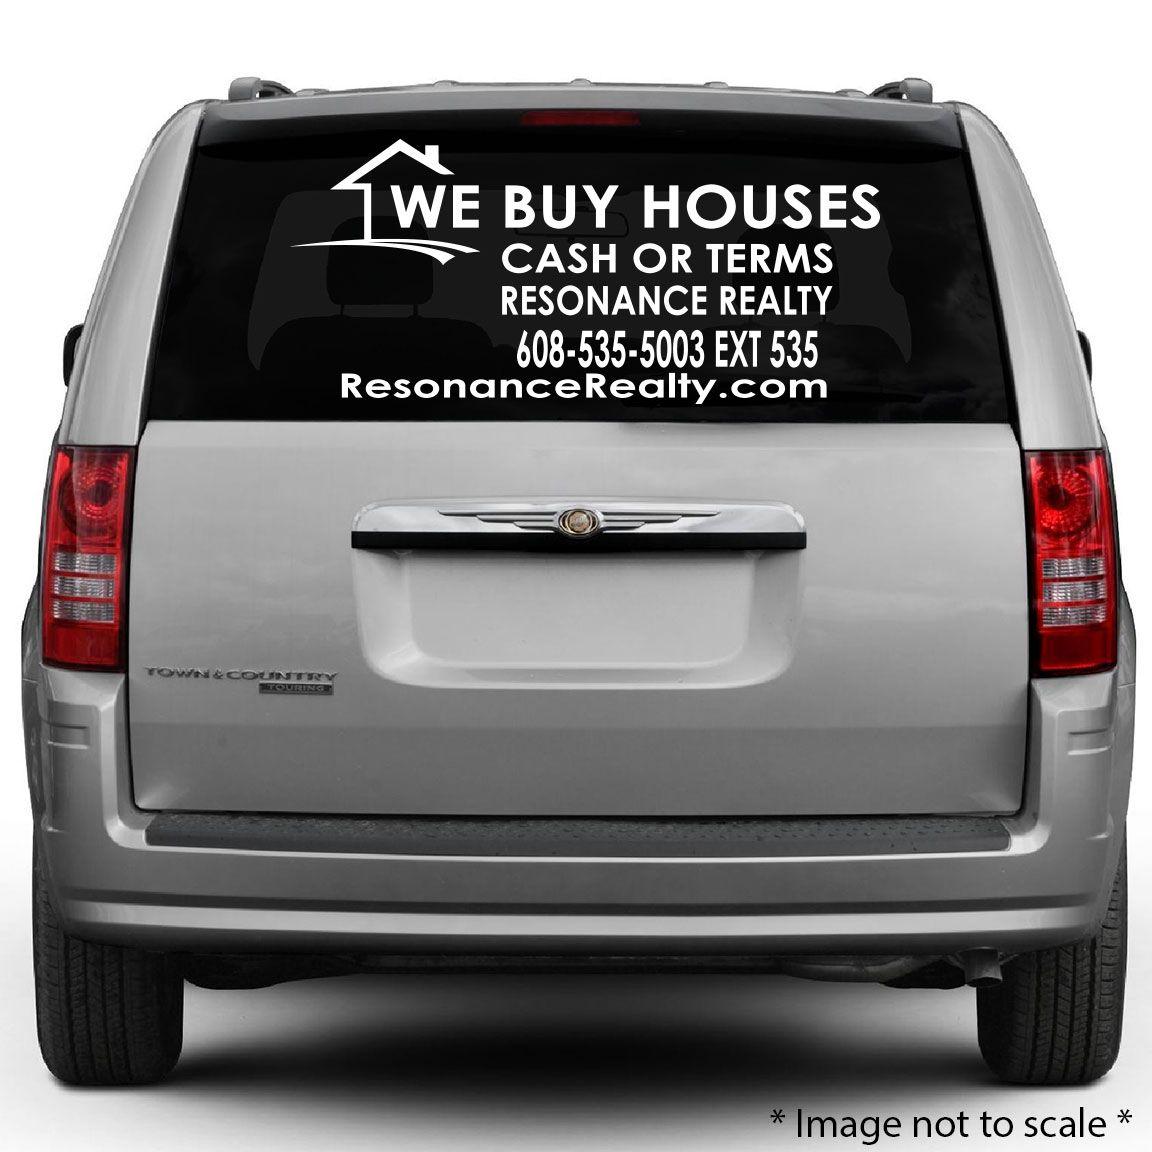 We Buy Houses | Resonance Realty | ResonanceRealty.com ...